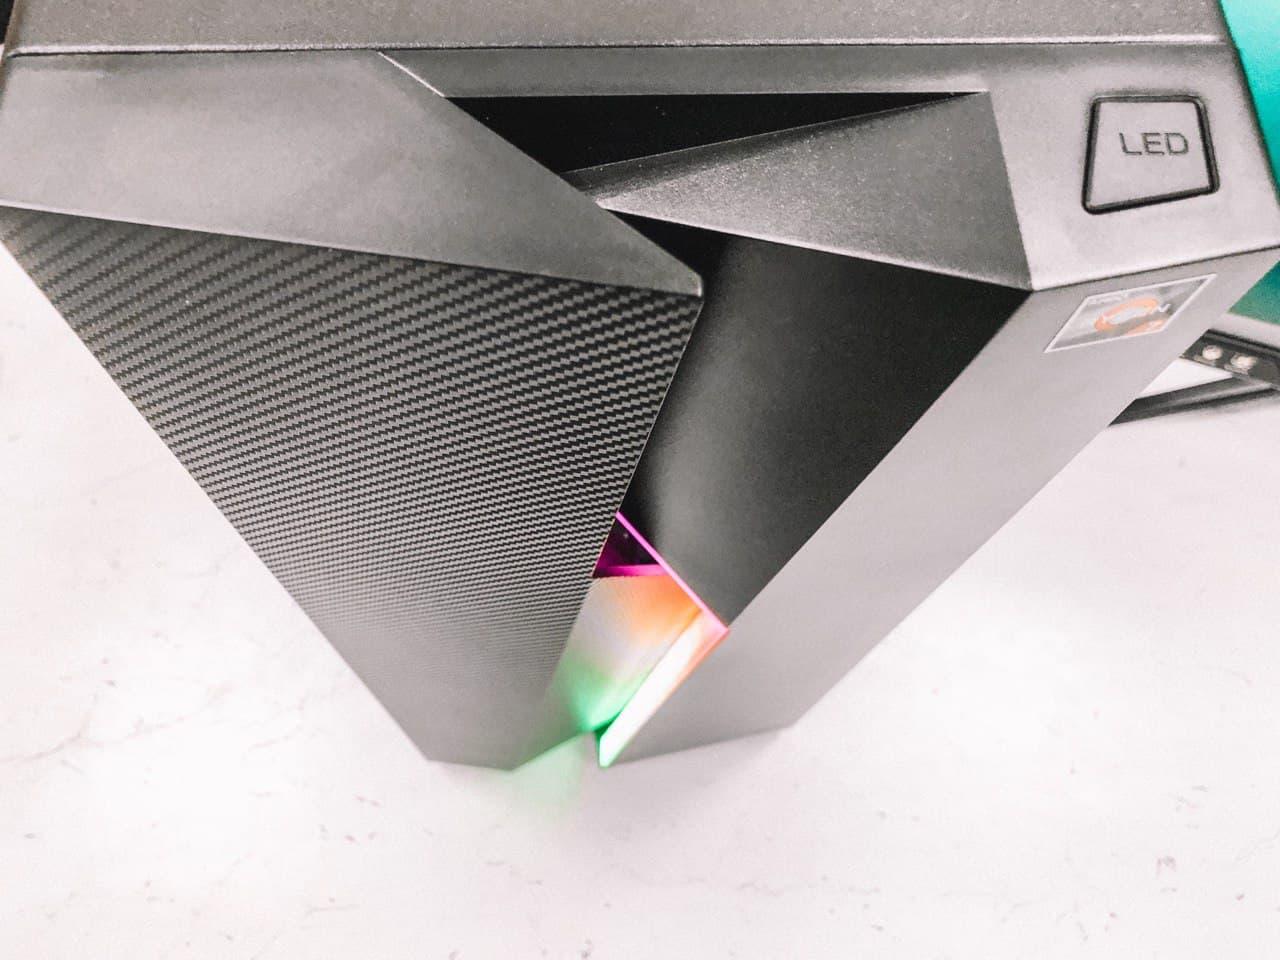 картинка Системный блок Status Home Ryzen 7 AMD + GeForce RTX 2060 от магазина Одежда+